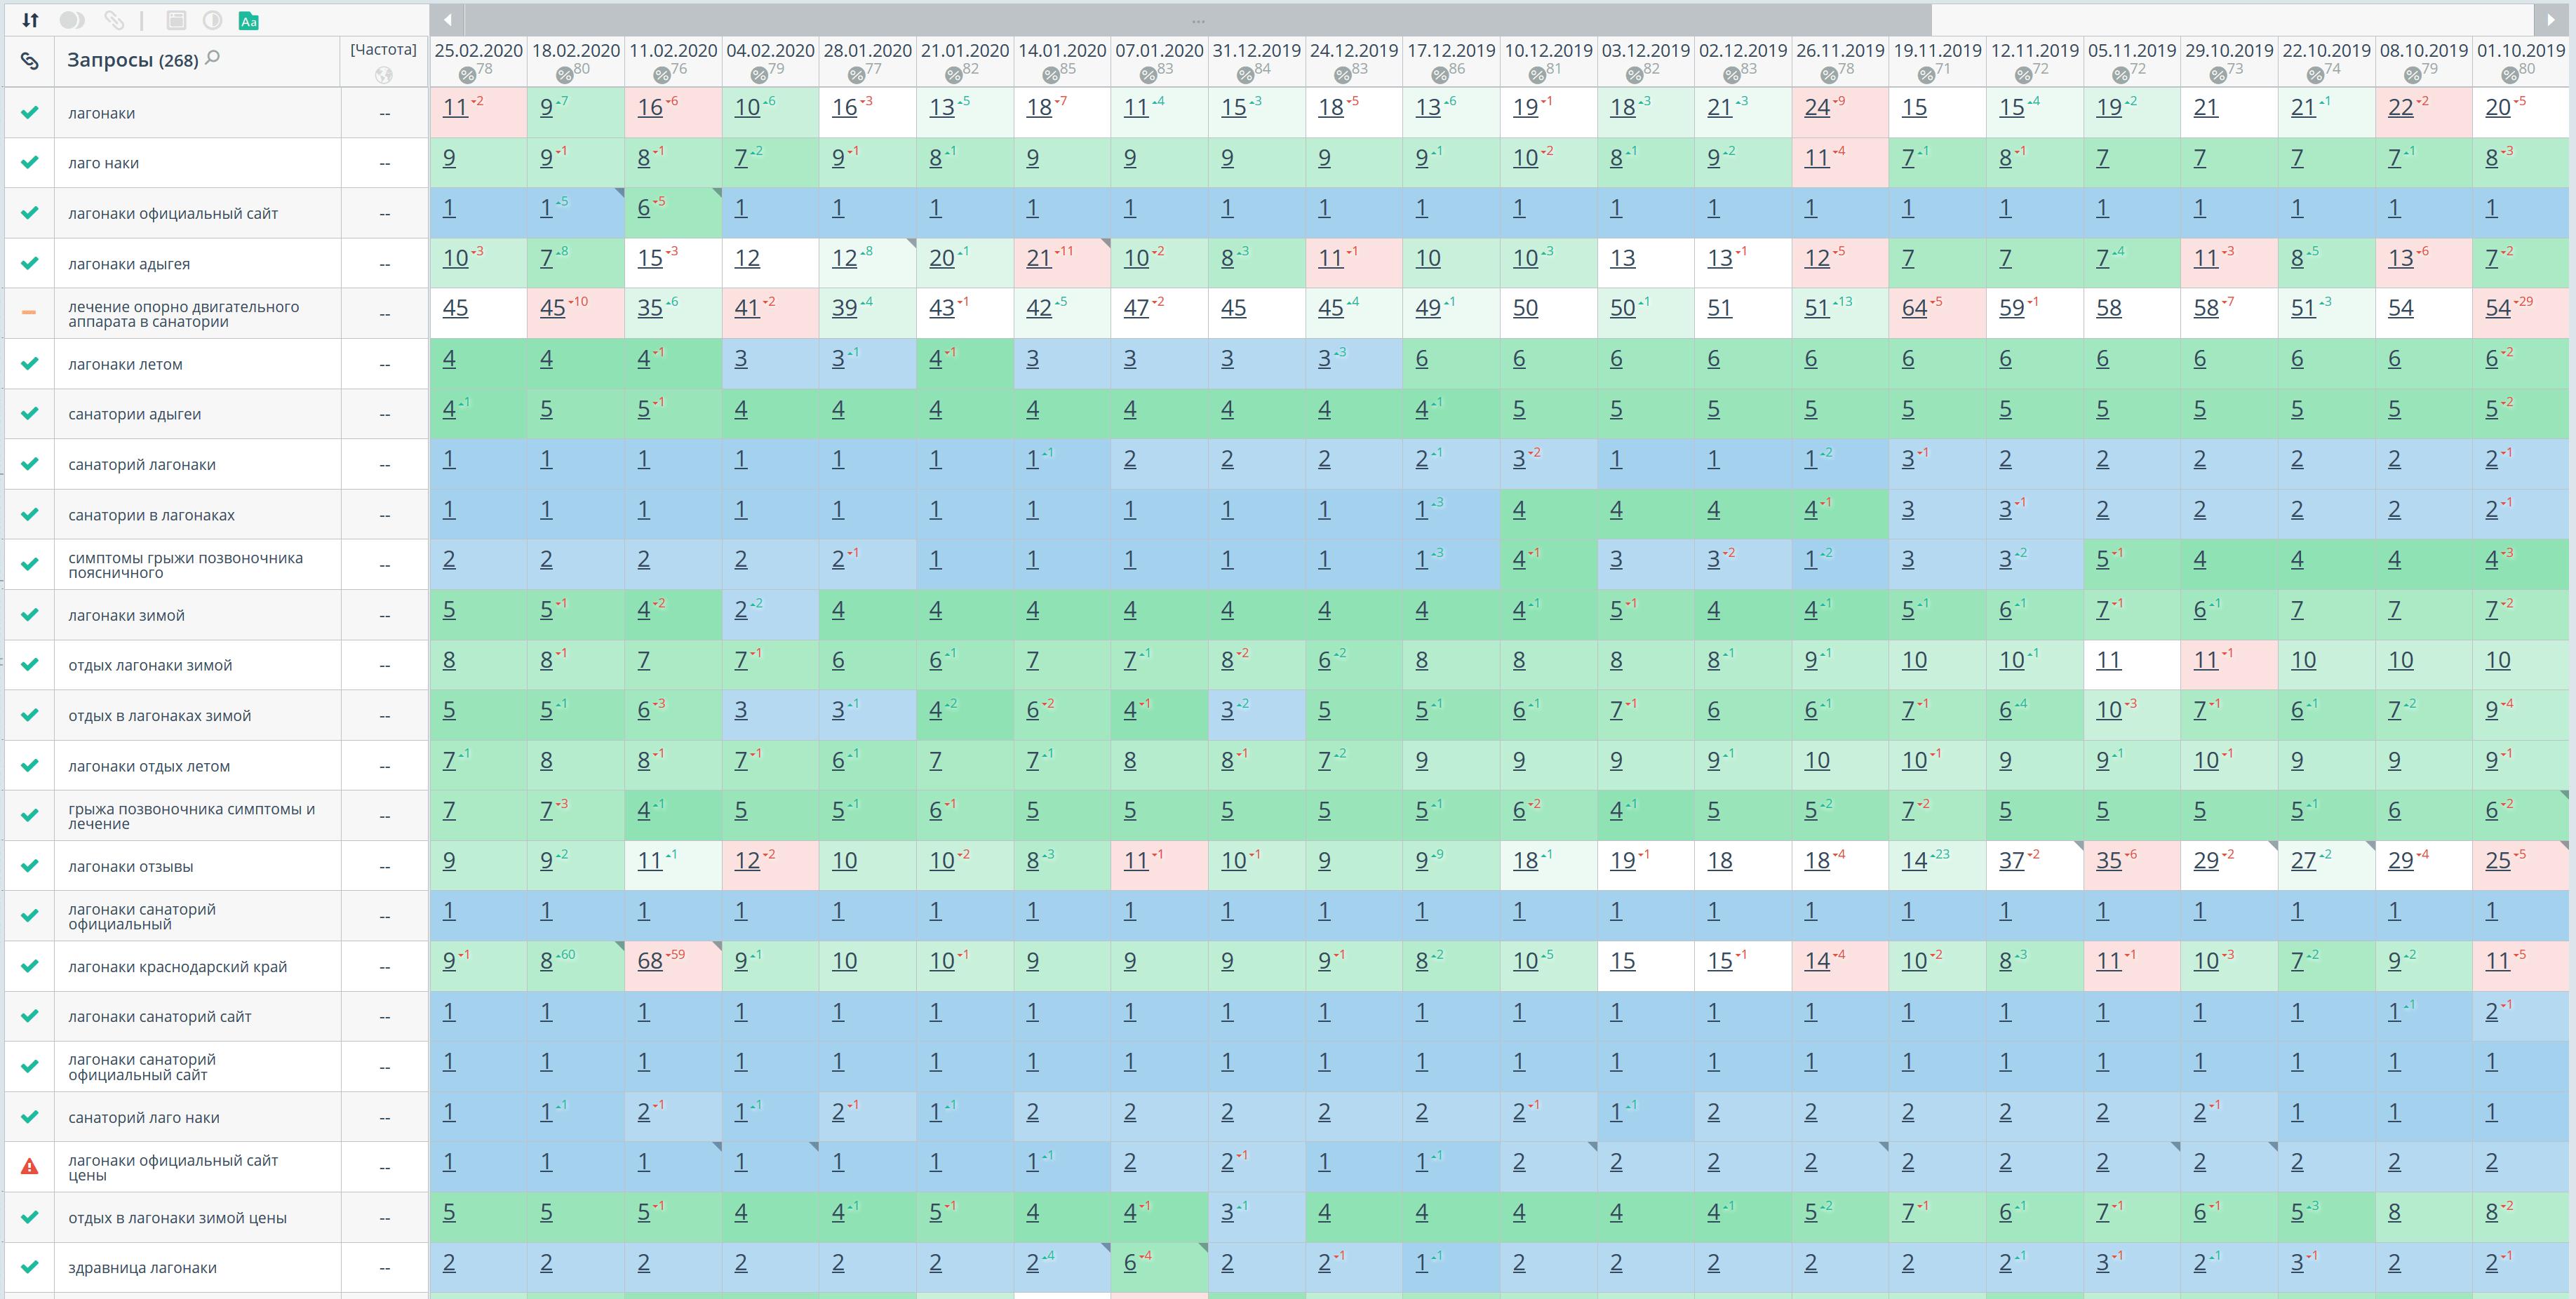 Статистика позиций по Google, регион Краснодар